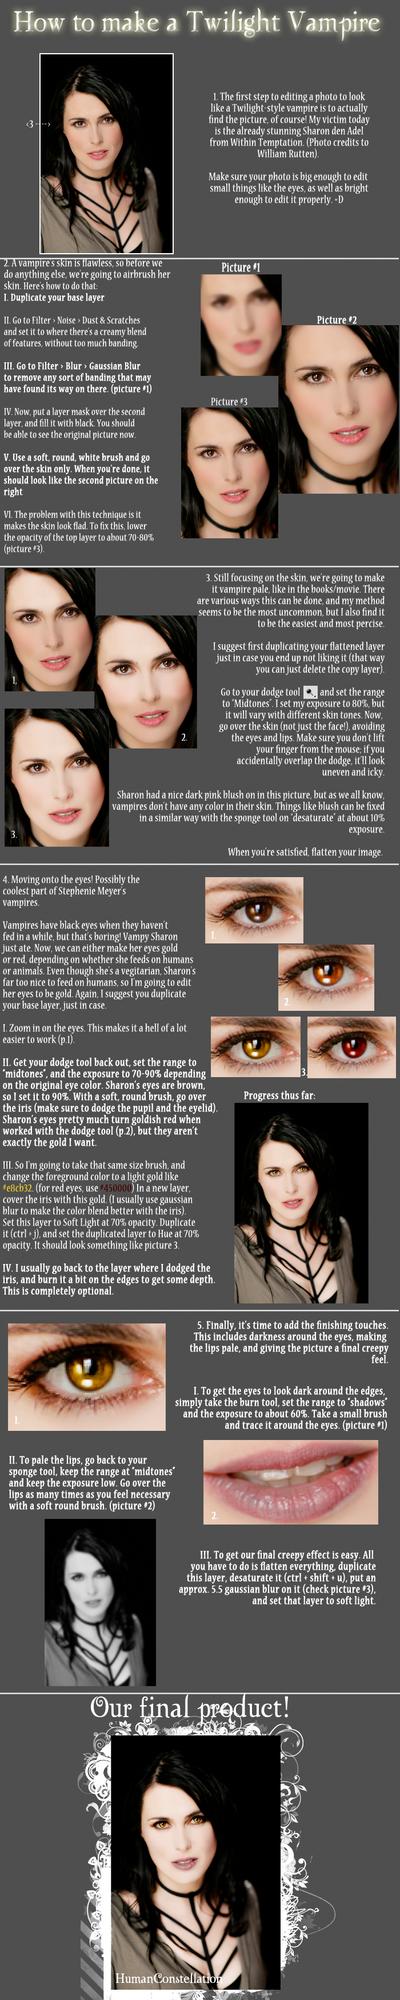 Twilight Vampire Tutorial by HumanConstellation